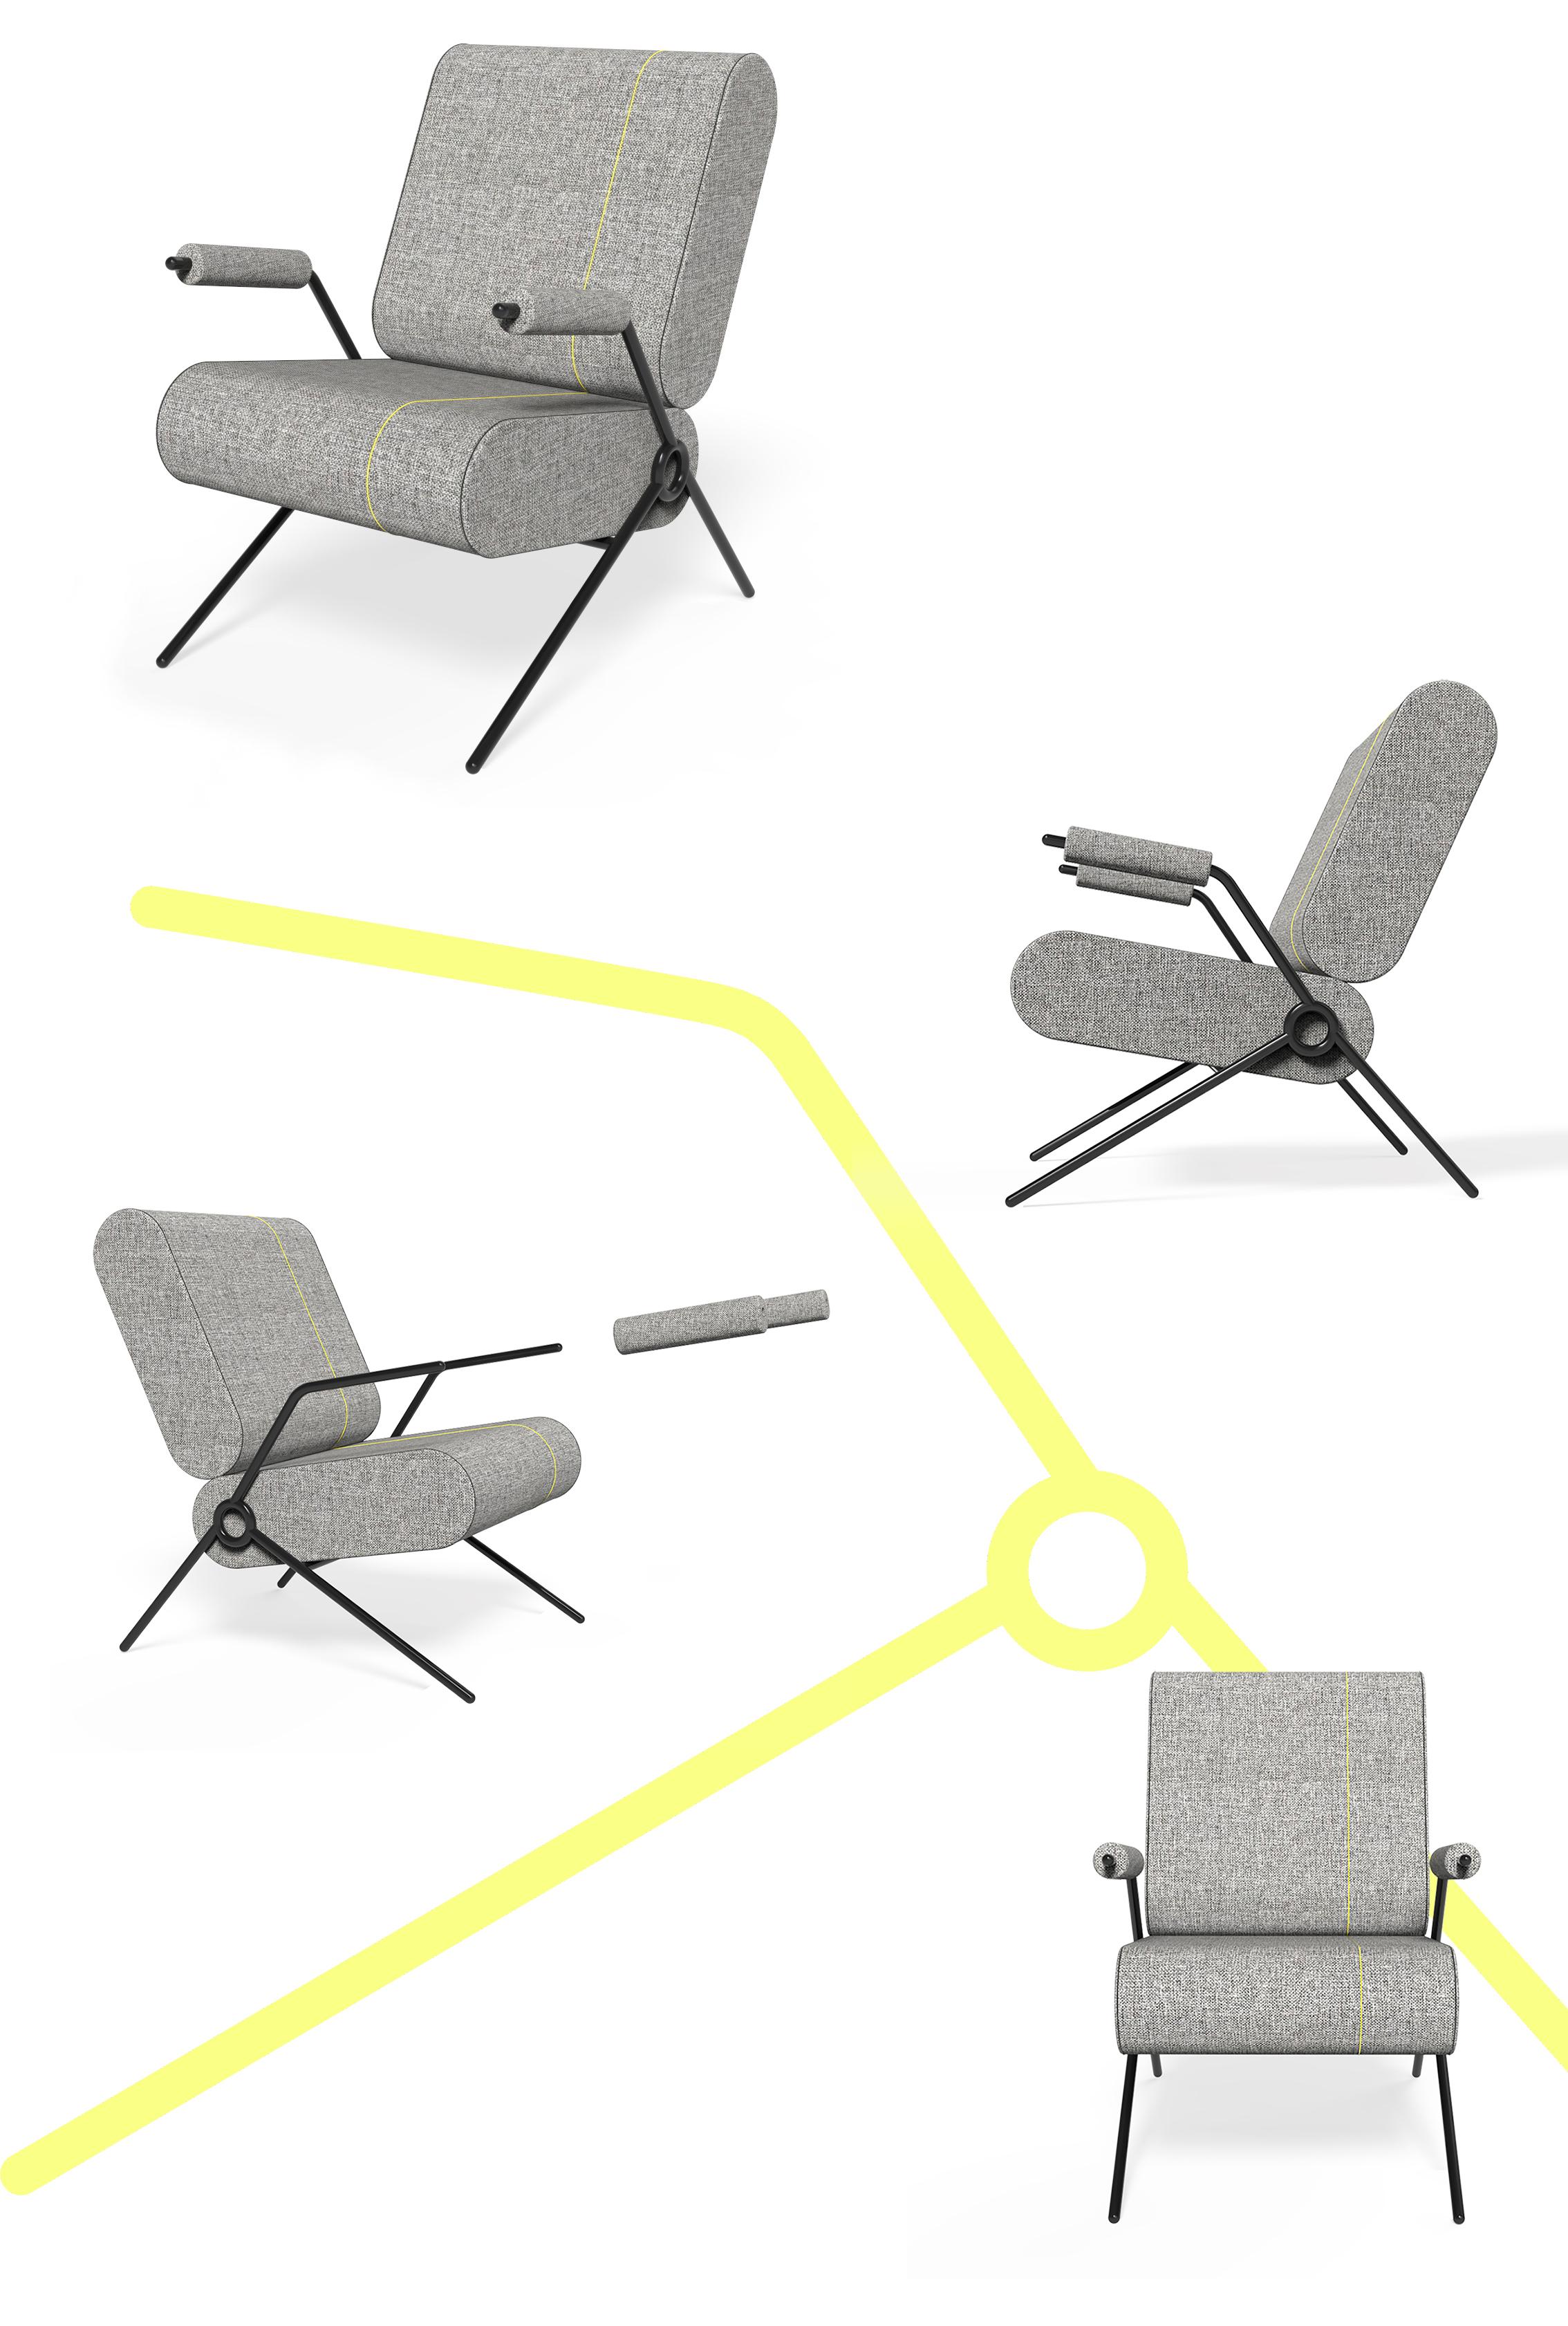 lofot-projekt-fotela-pawlowska-design-calosc